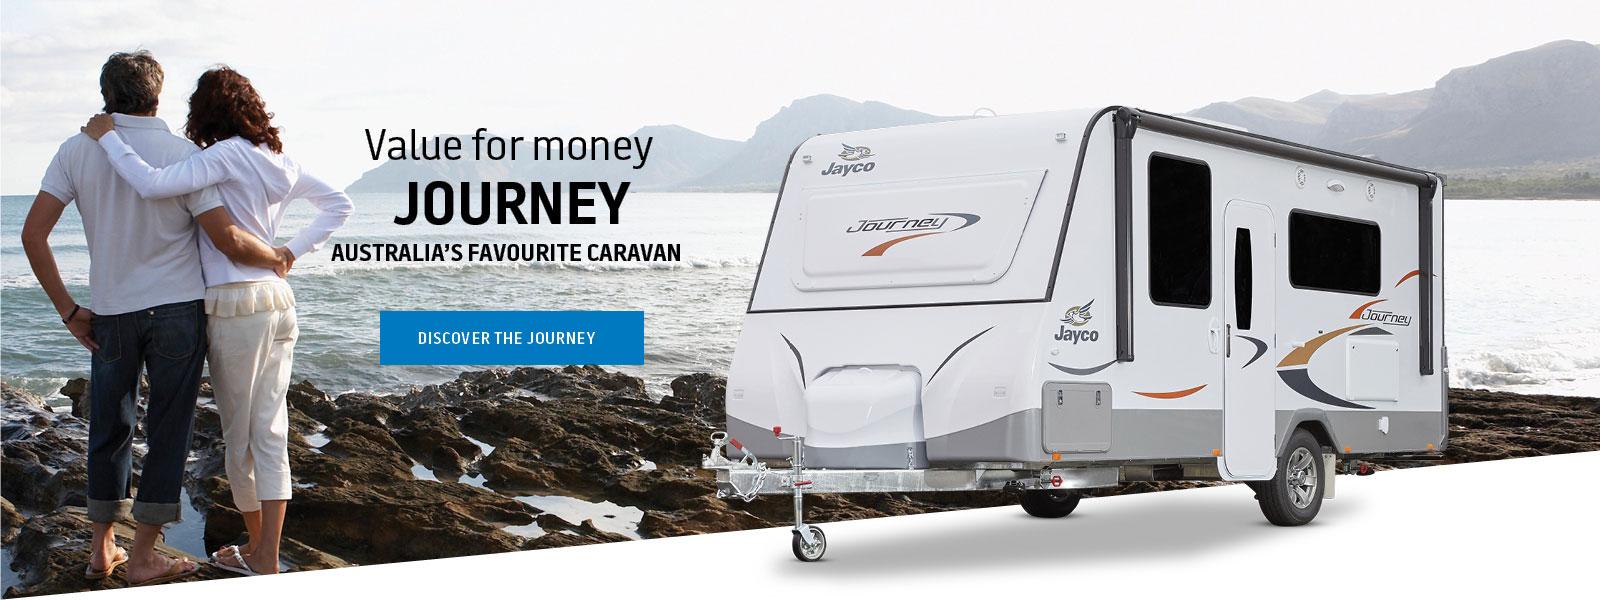 2019 06 06 Web Banners 1600x600 Journey - 2019 Jayco JOURNEY CARAVAN